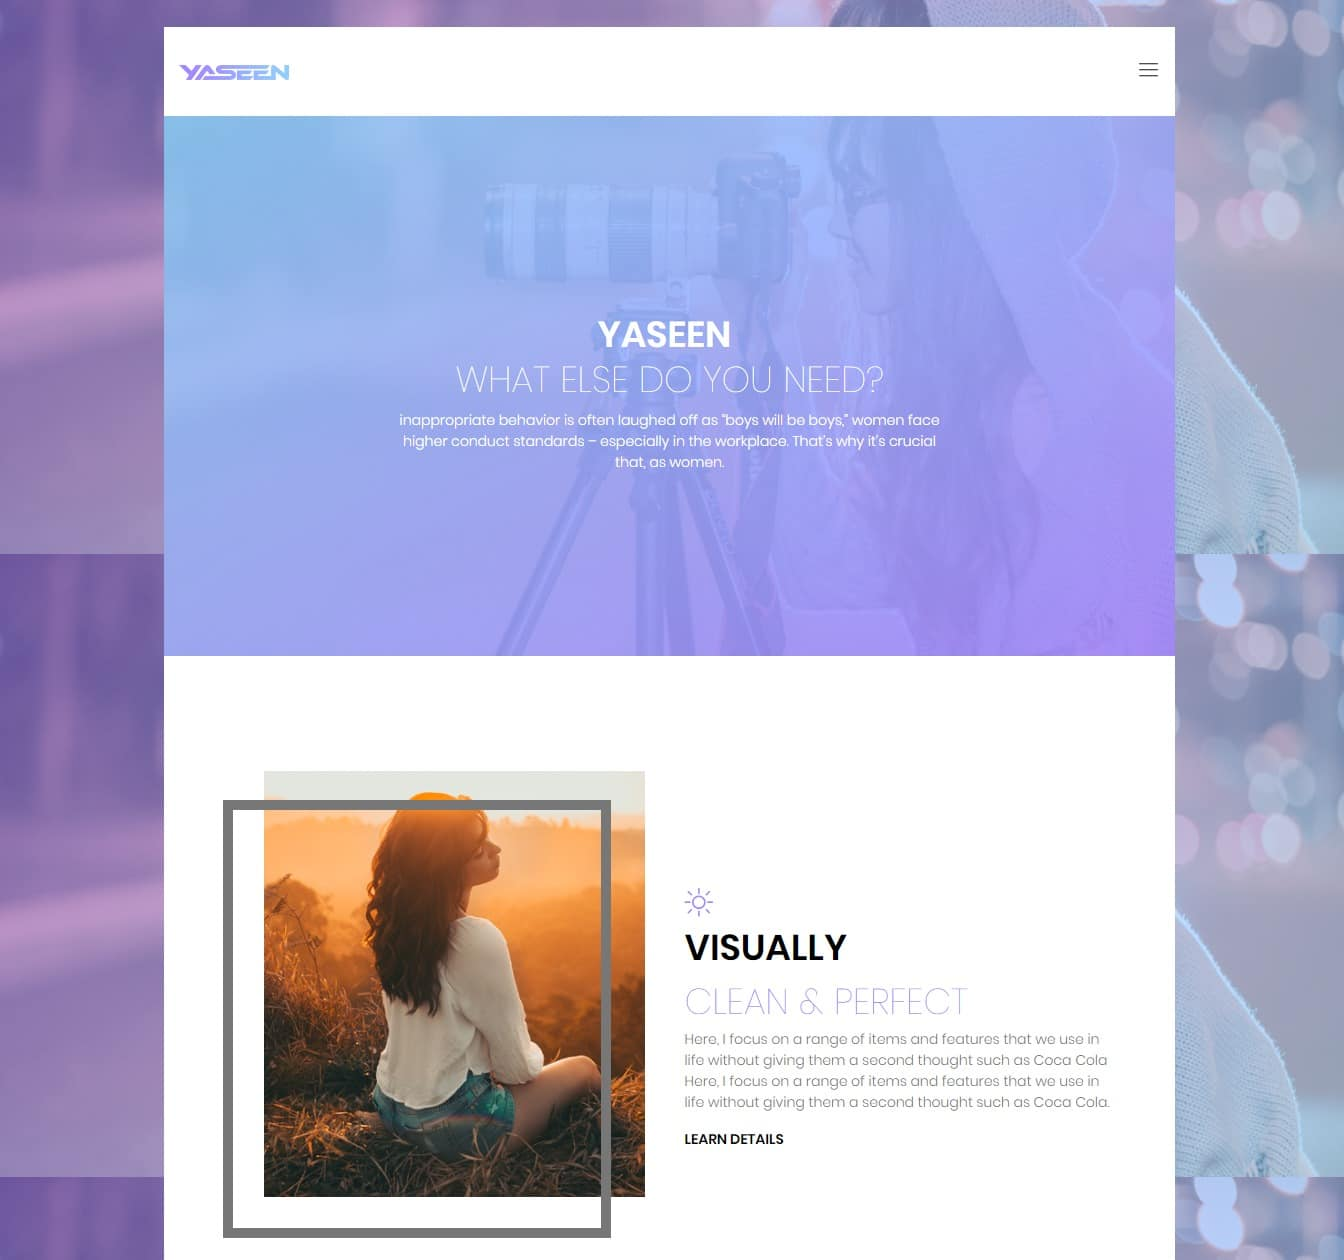 yaseen-gallery-website-template